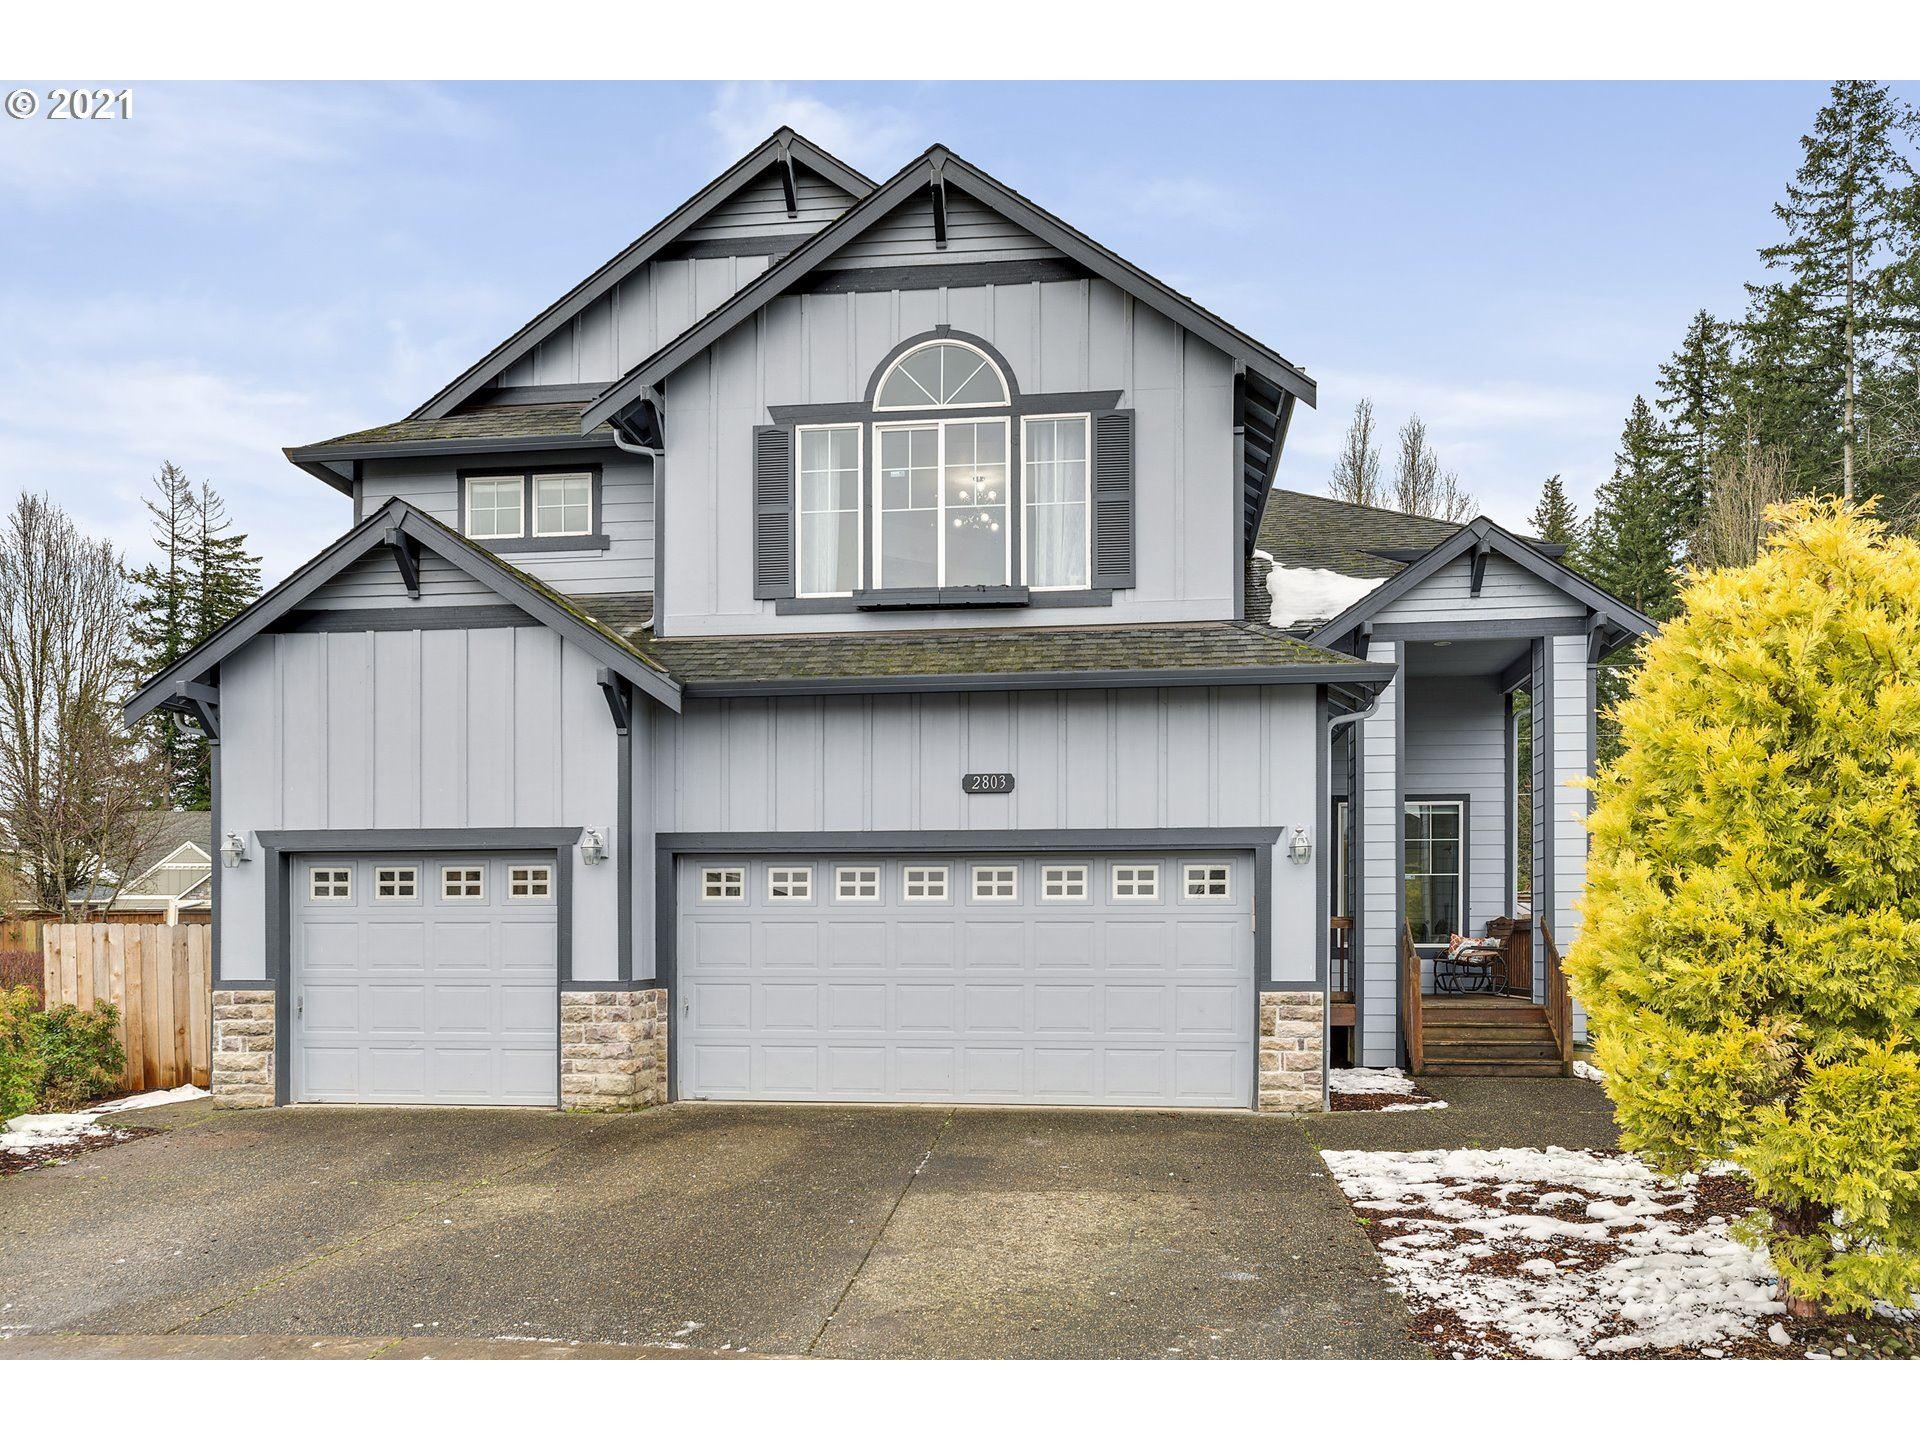 Photo for 2803 NE 185TH CT, Vancouver, WA 98682 (MLS # 21073055)